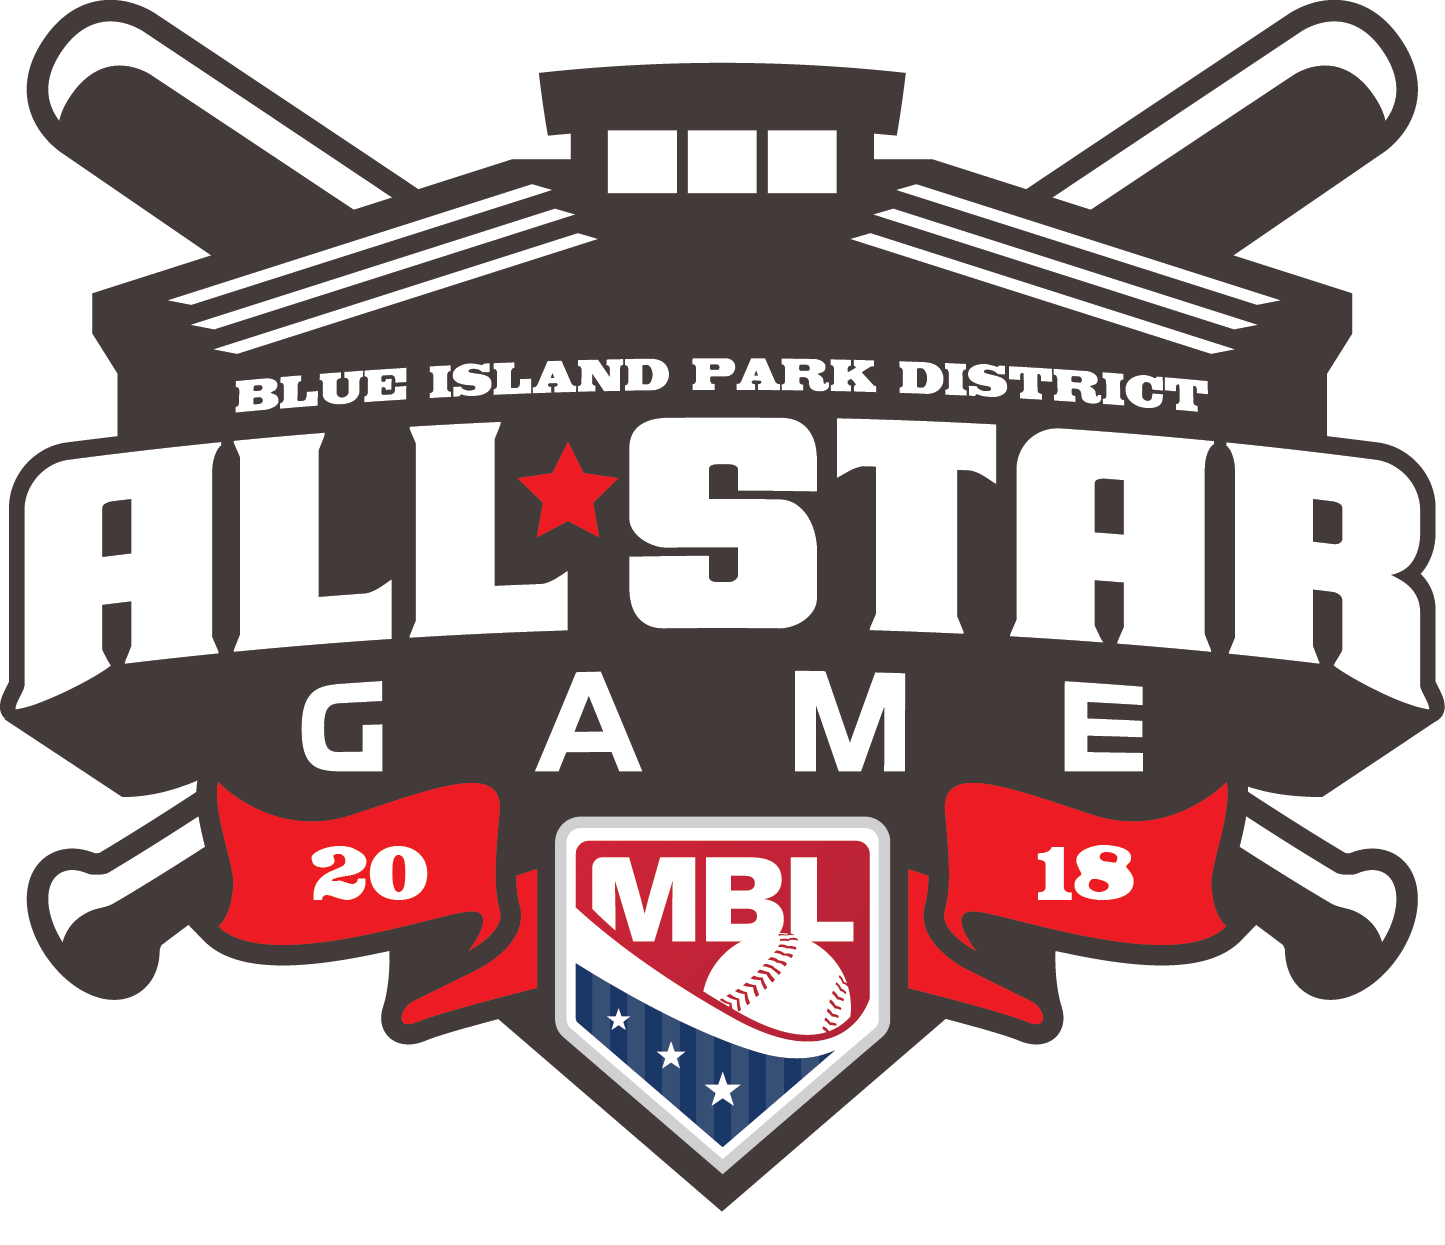 Men's Baseball League All Star Logo